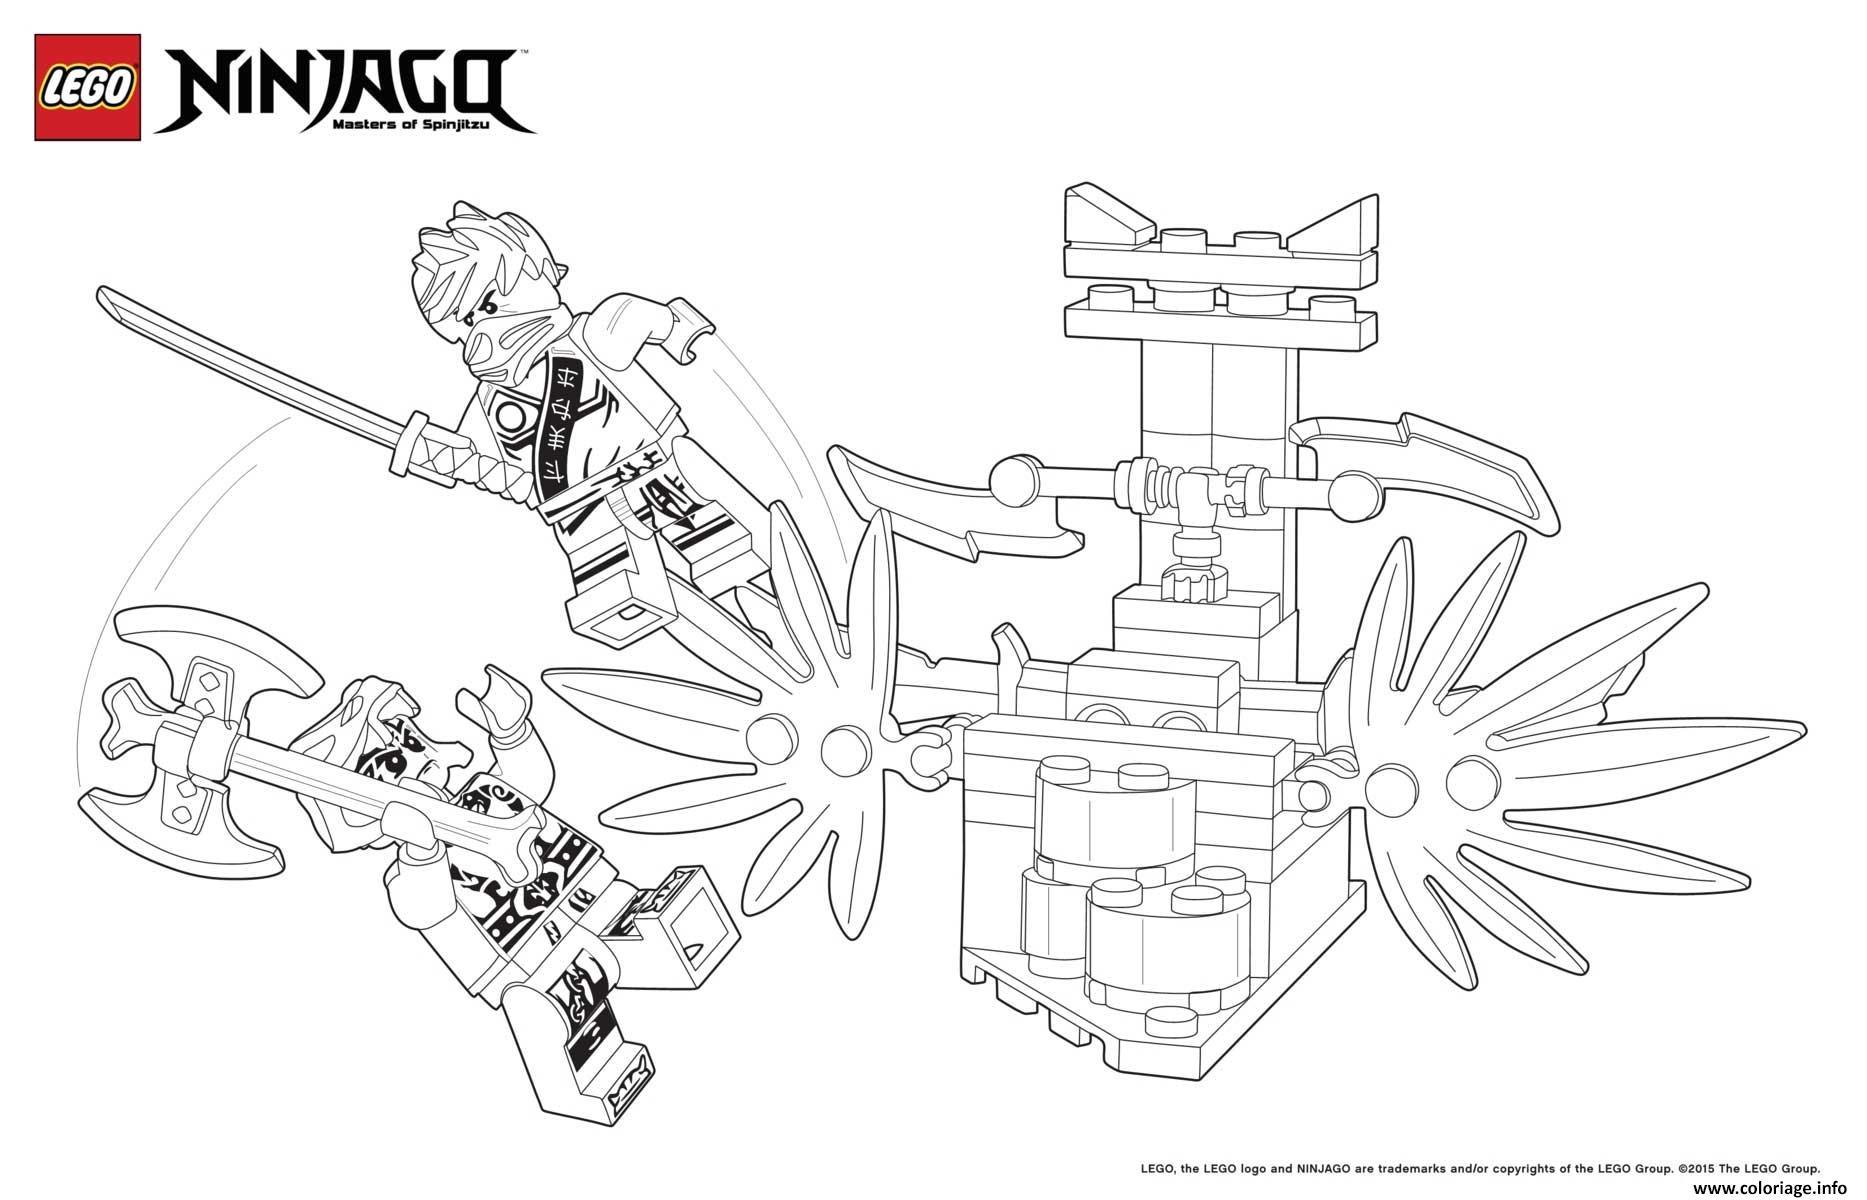 Dessin combat de ninjas lego Coloriage Gratuit à Imprimer